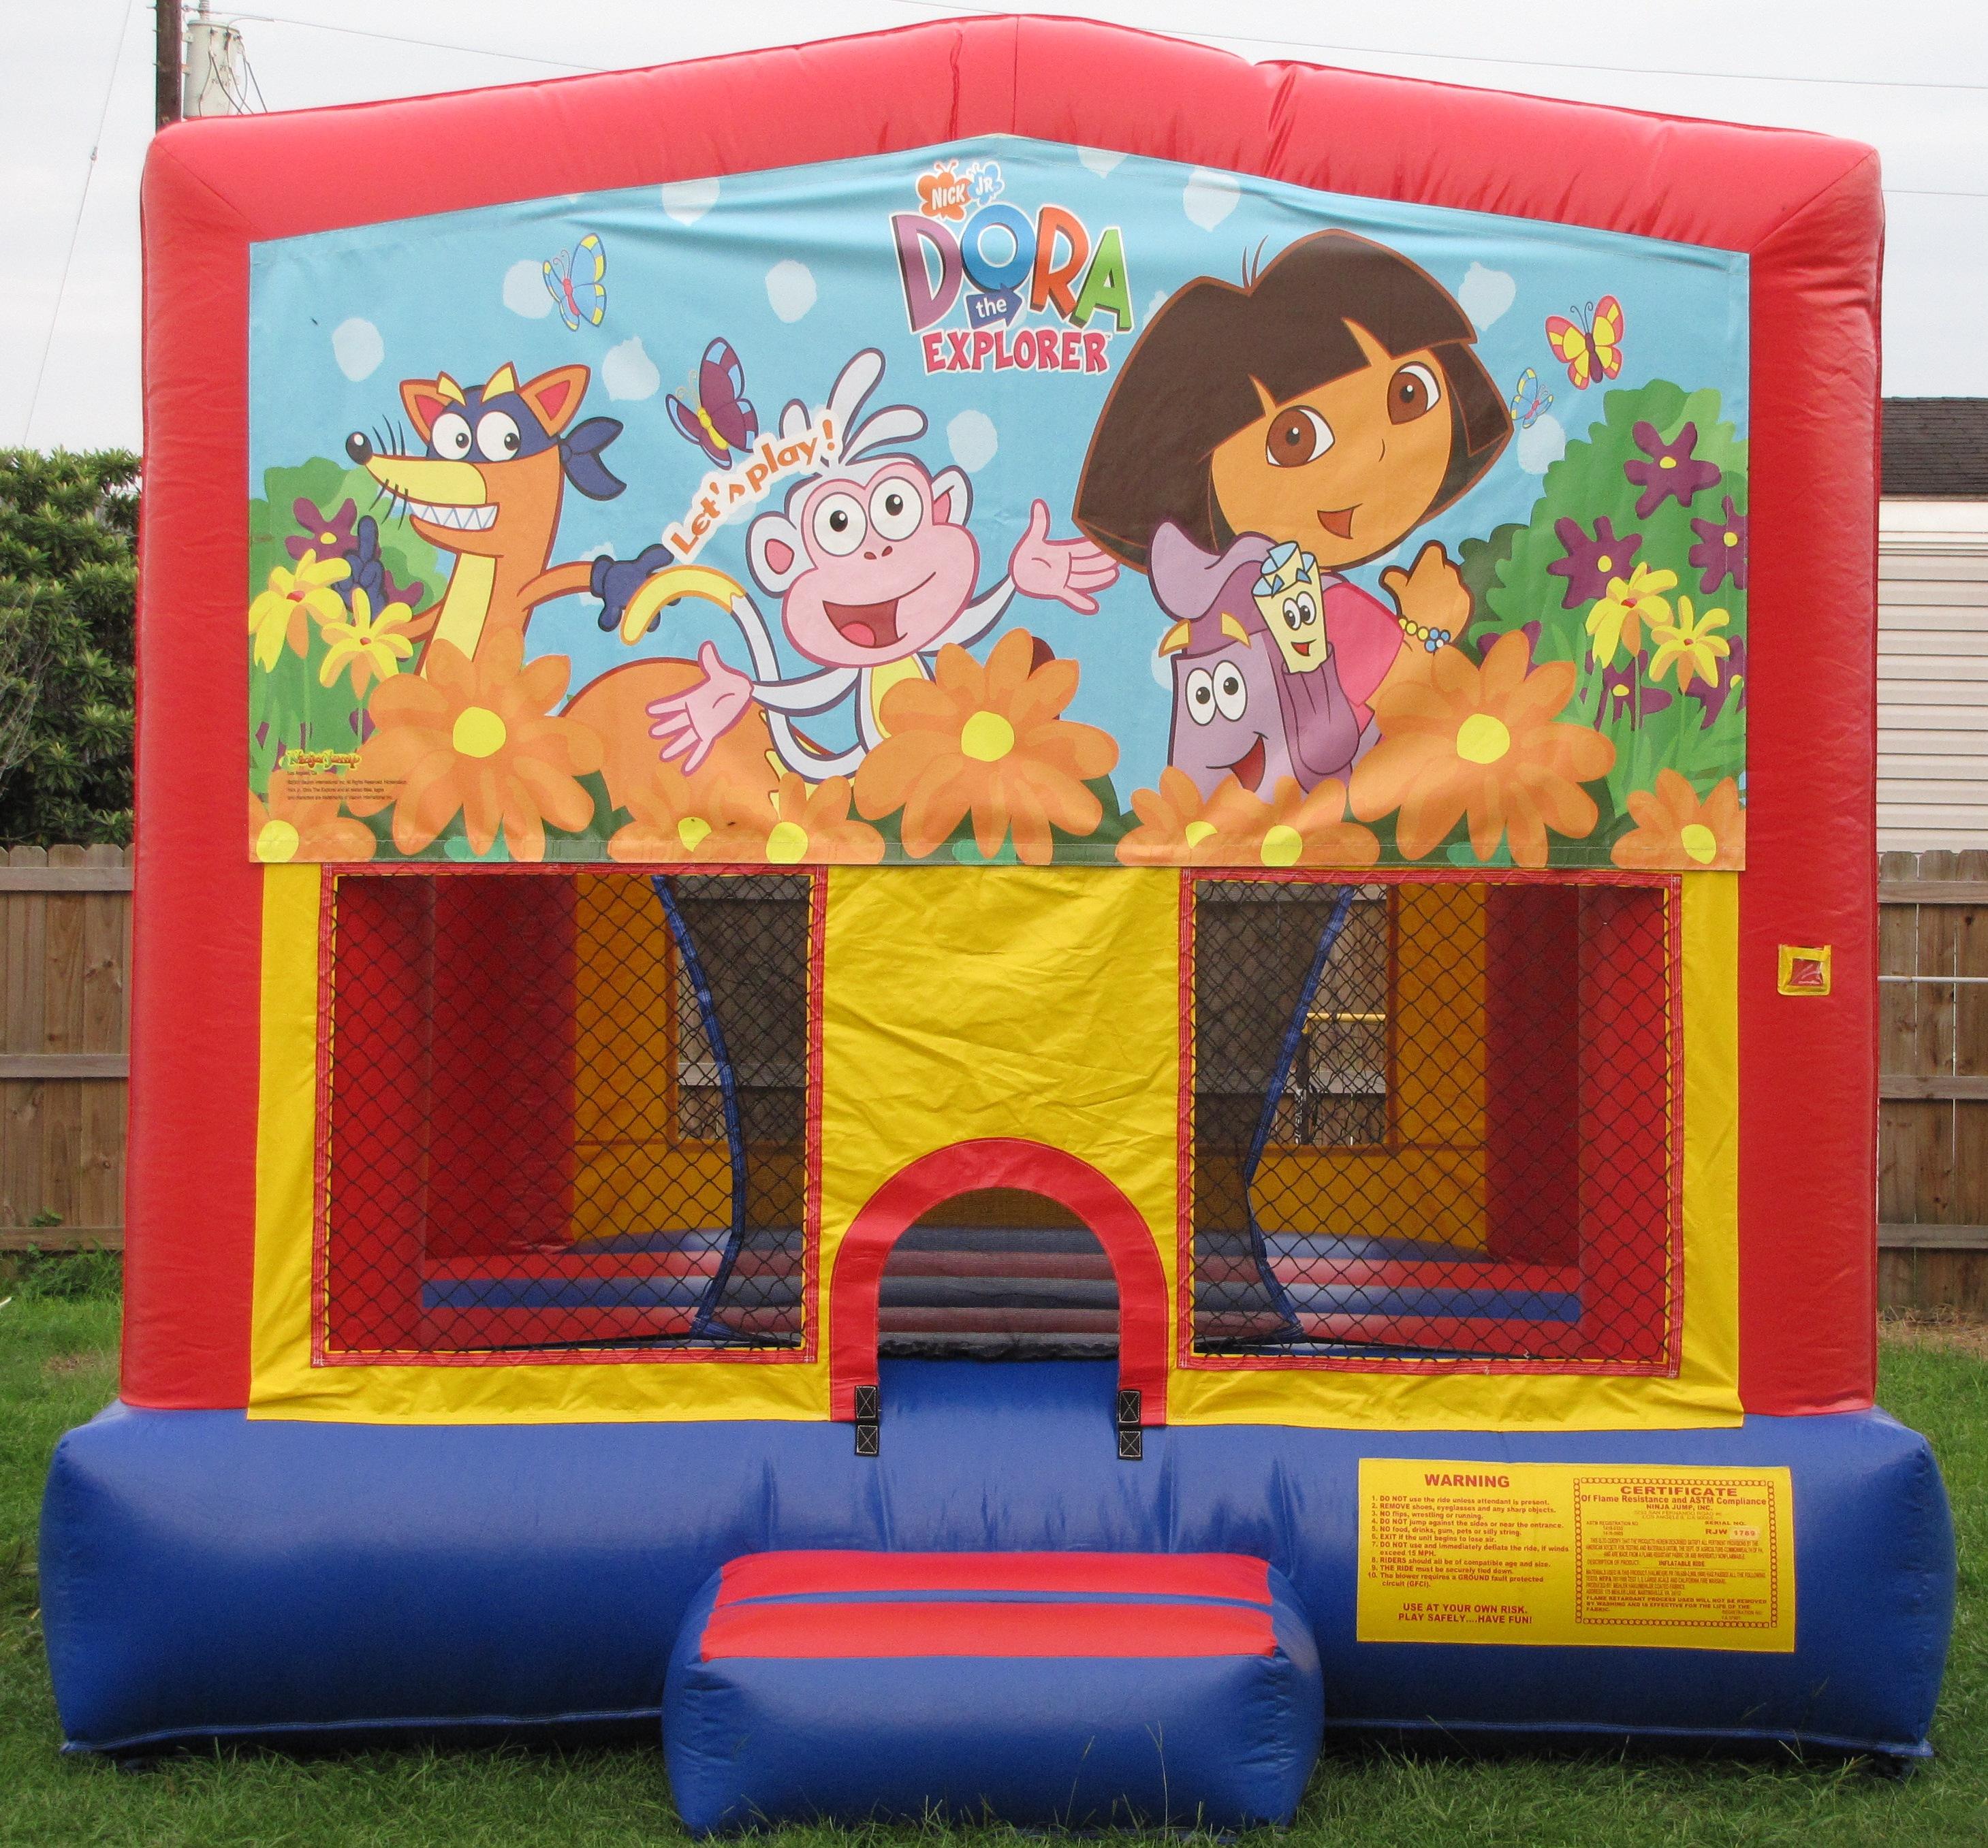 Dora The Explorer Bounce House